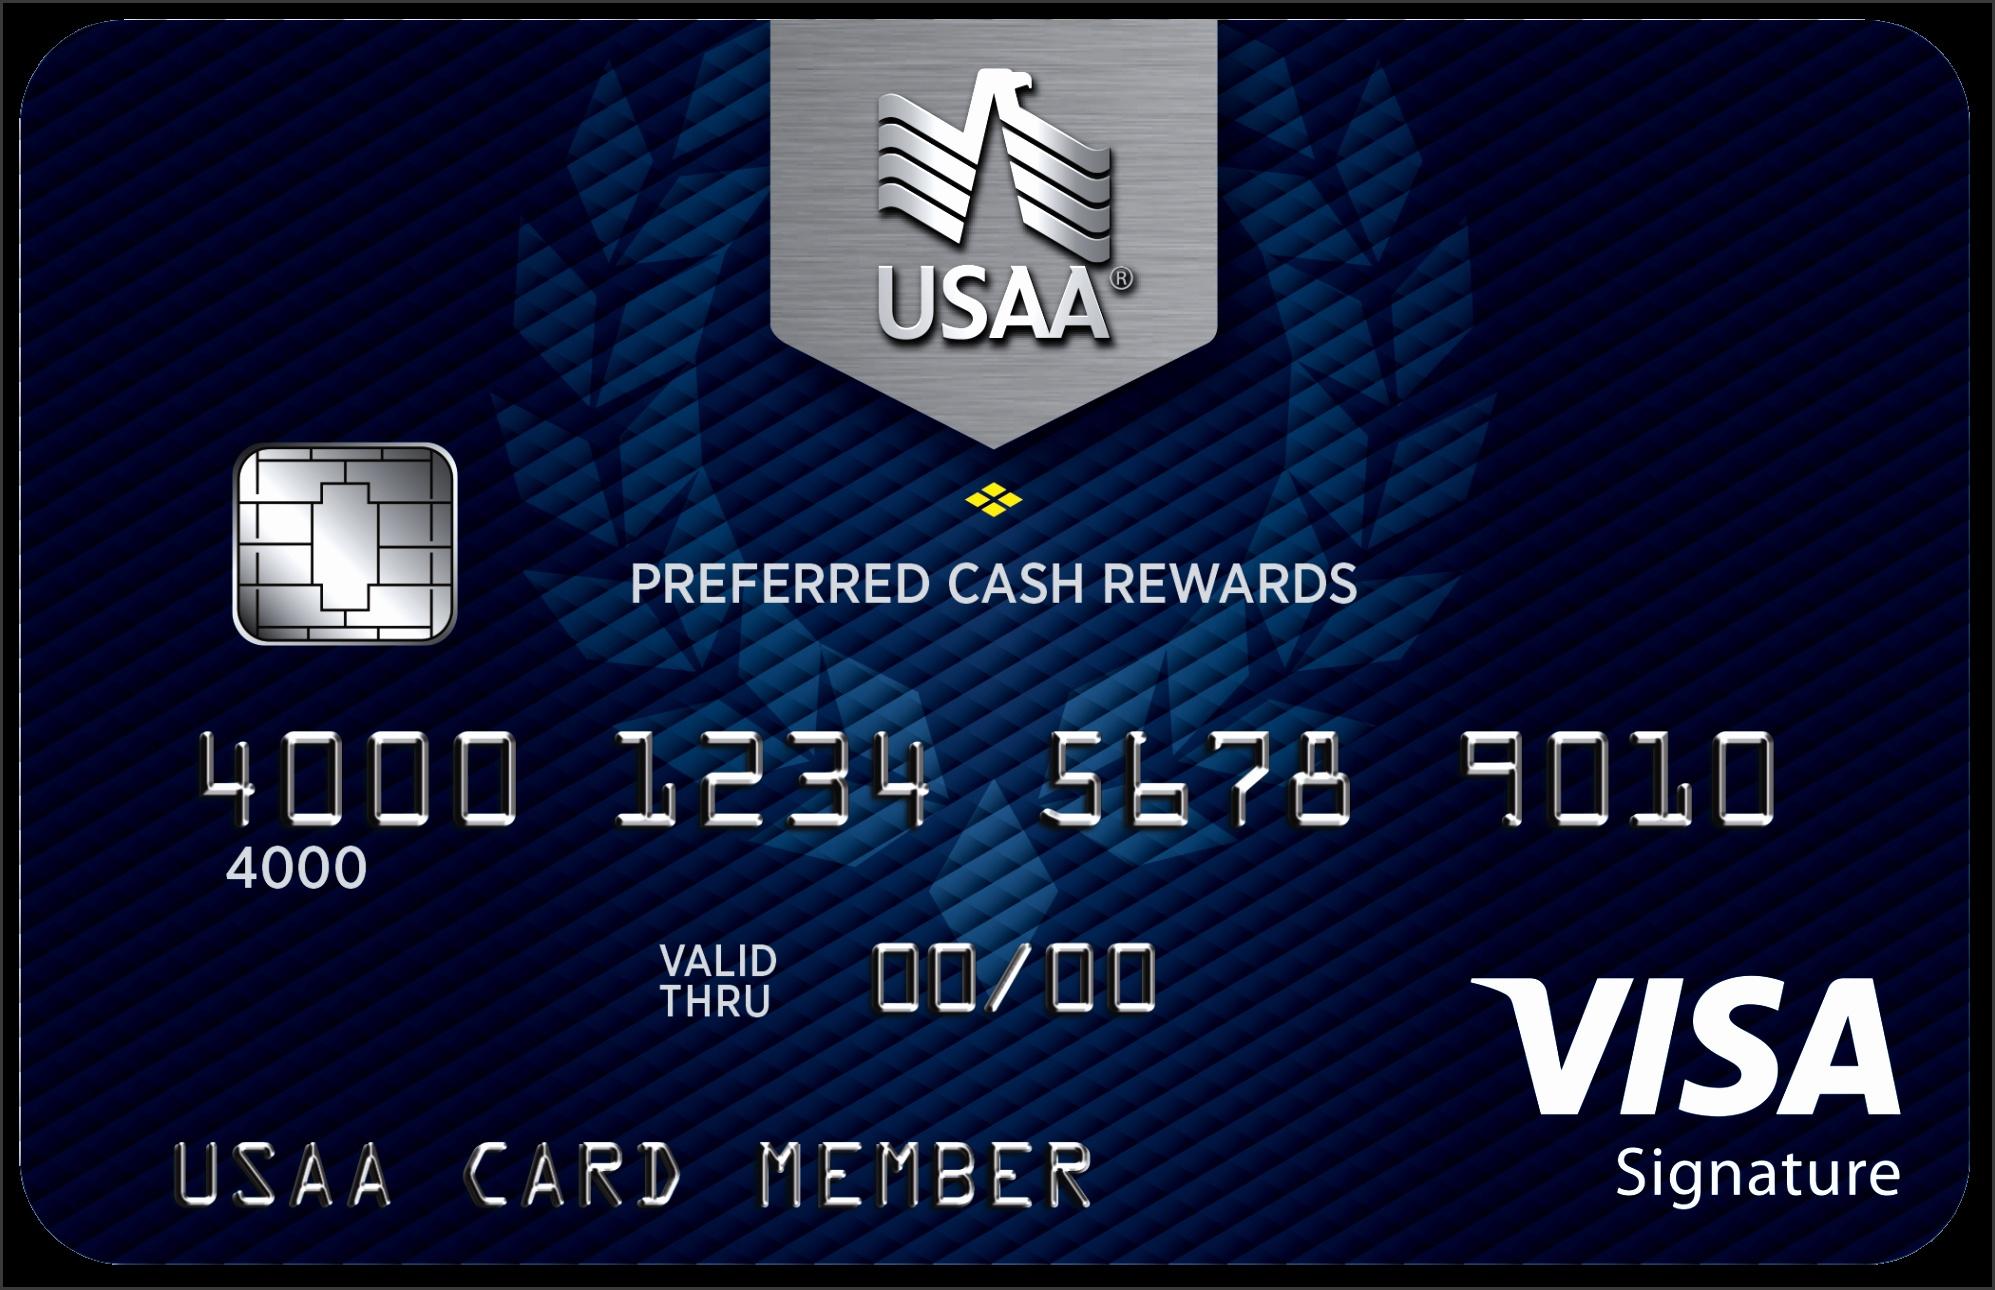 Preferred Cash Rewards Visa Signature Credit Card